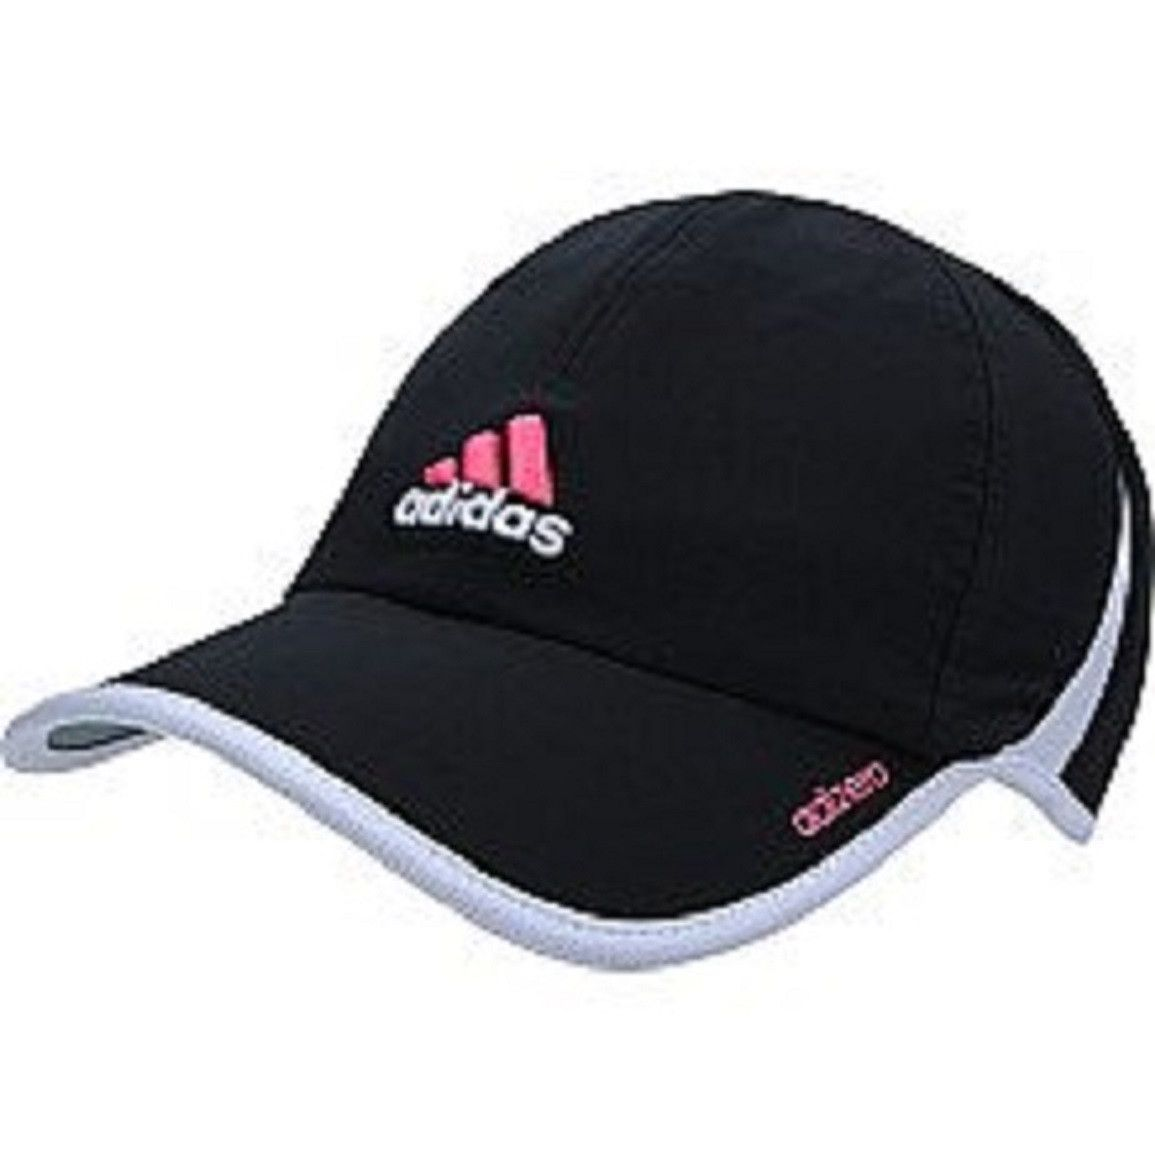 Adidas Womens Fit Adizero Climacool UPF 50 Hat 5aa7a51502c7